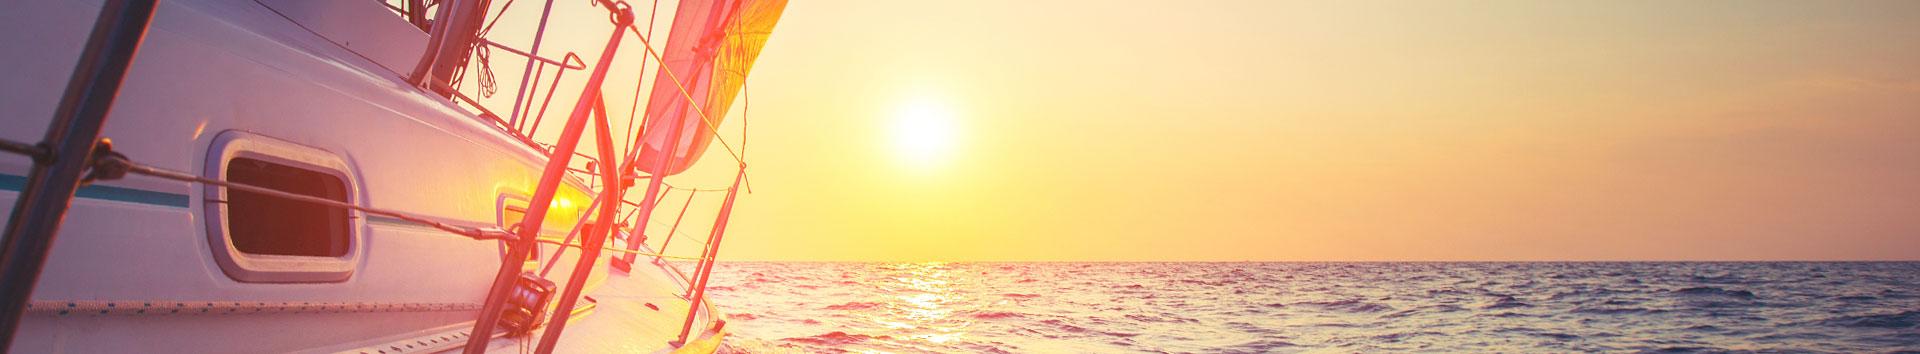 leadership-sunset-sailing1